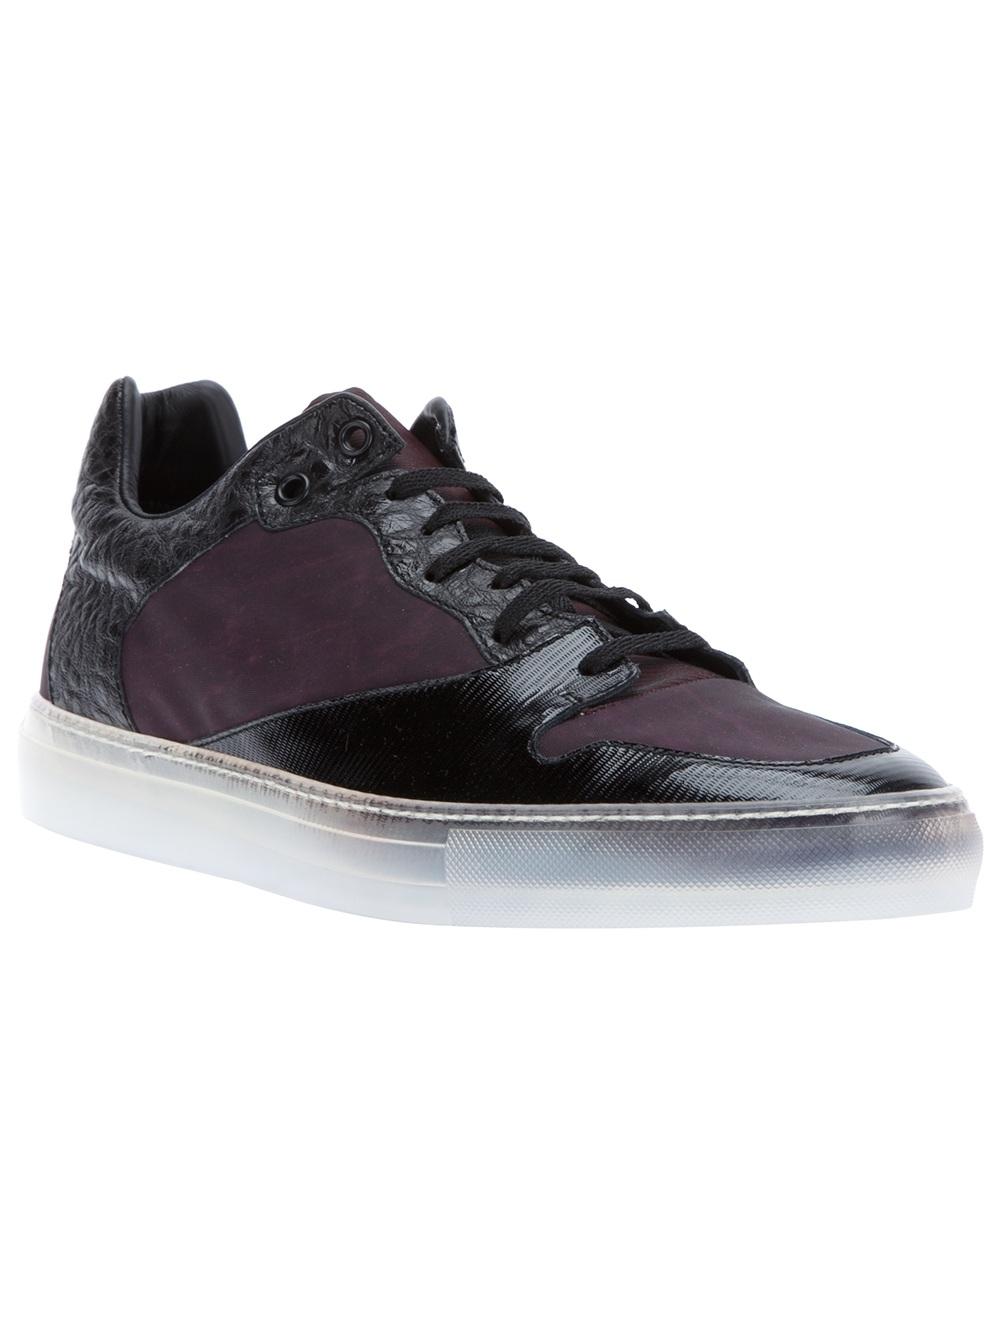 balenciaga textured sneaker in black for men lyst. Black Bedroom Furniture Sets. Home Design Ideas